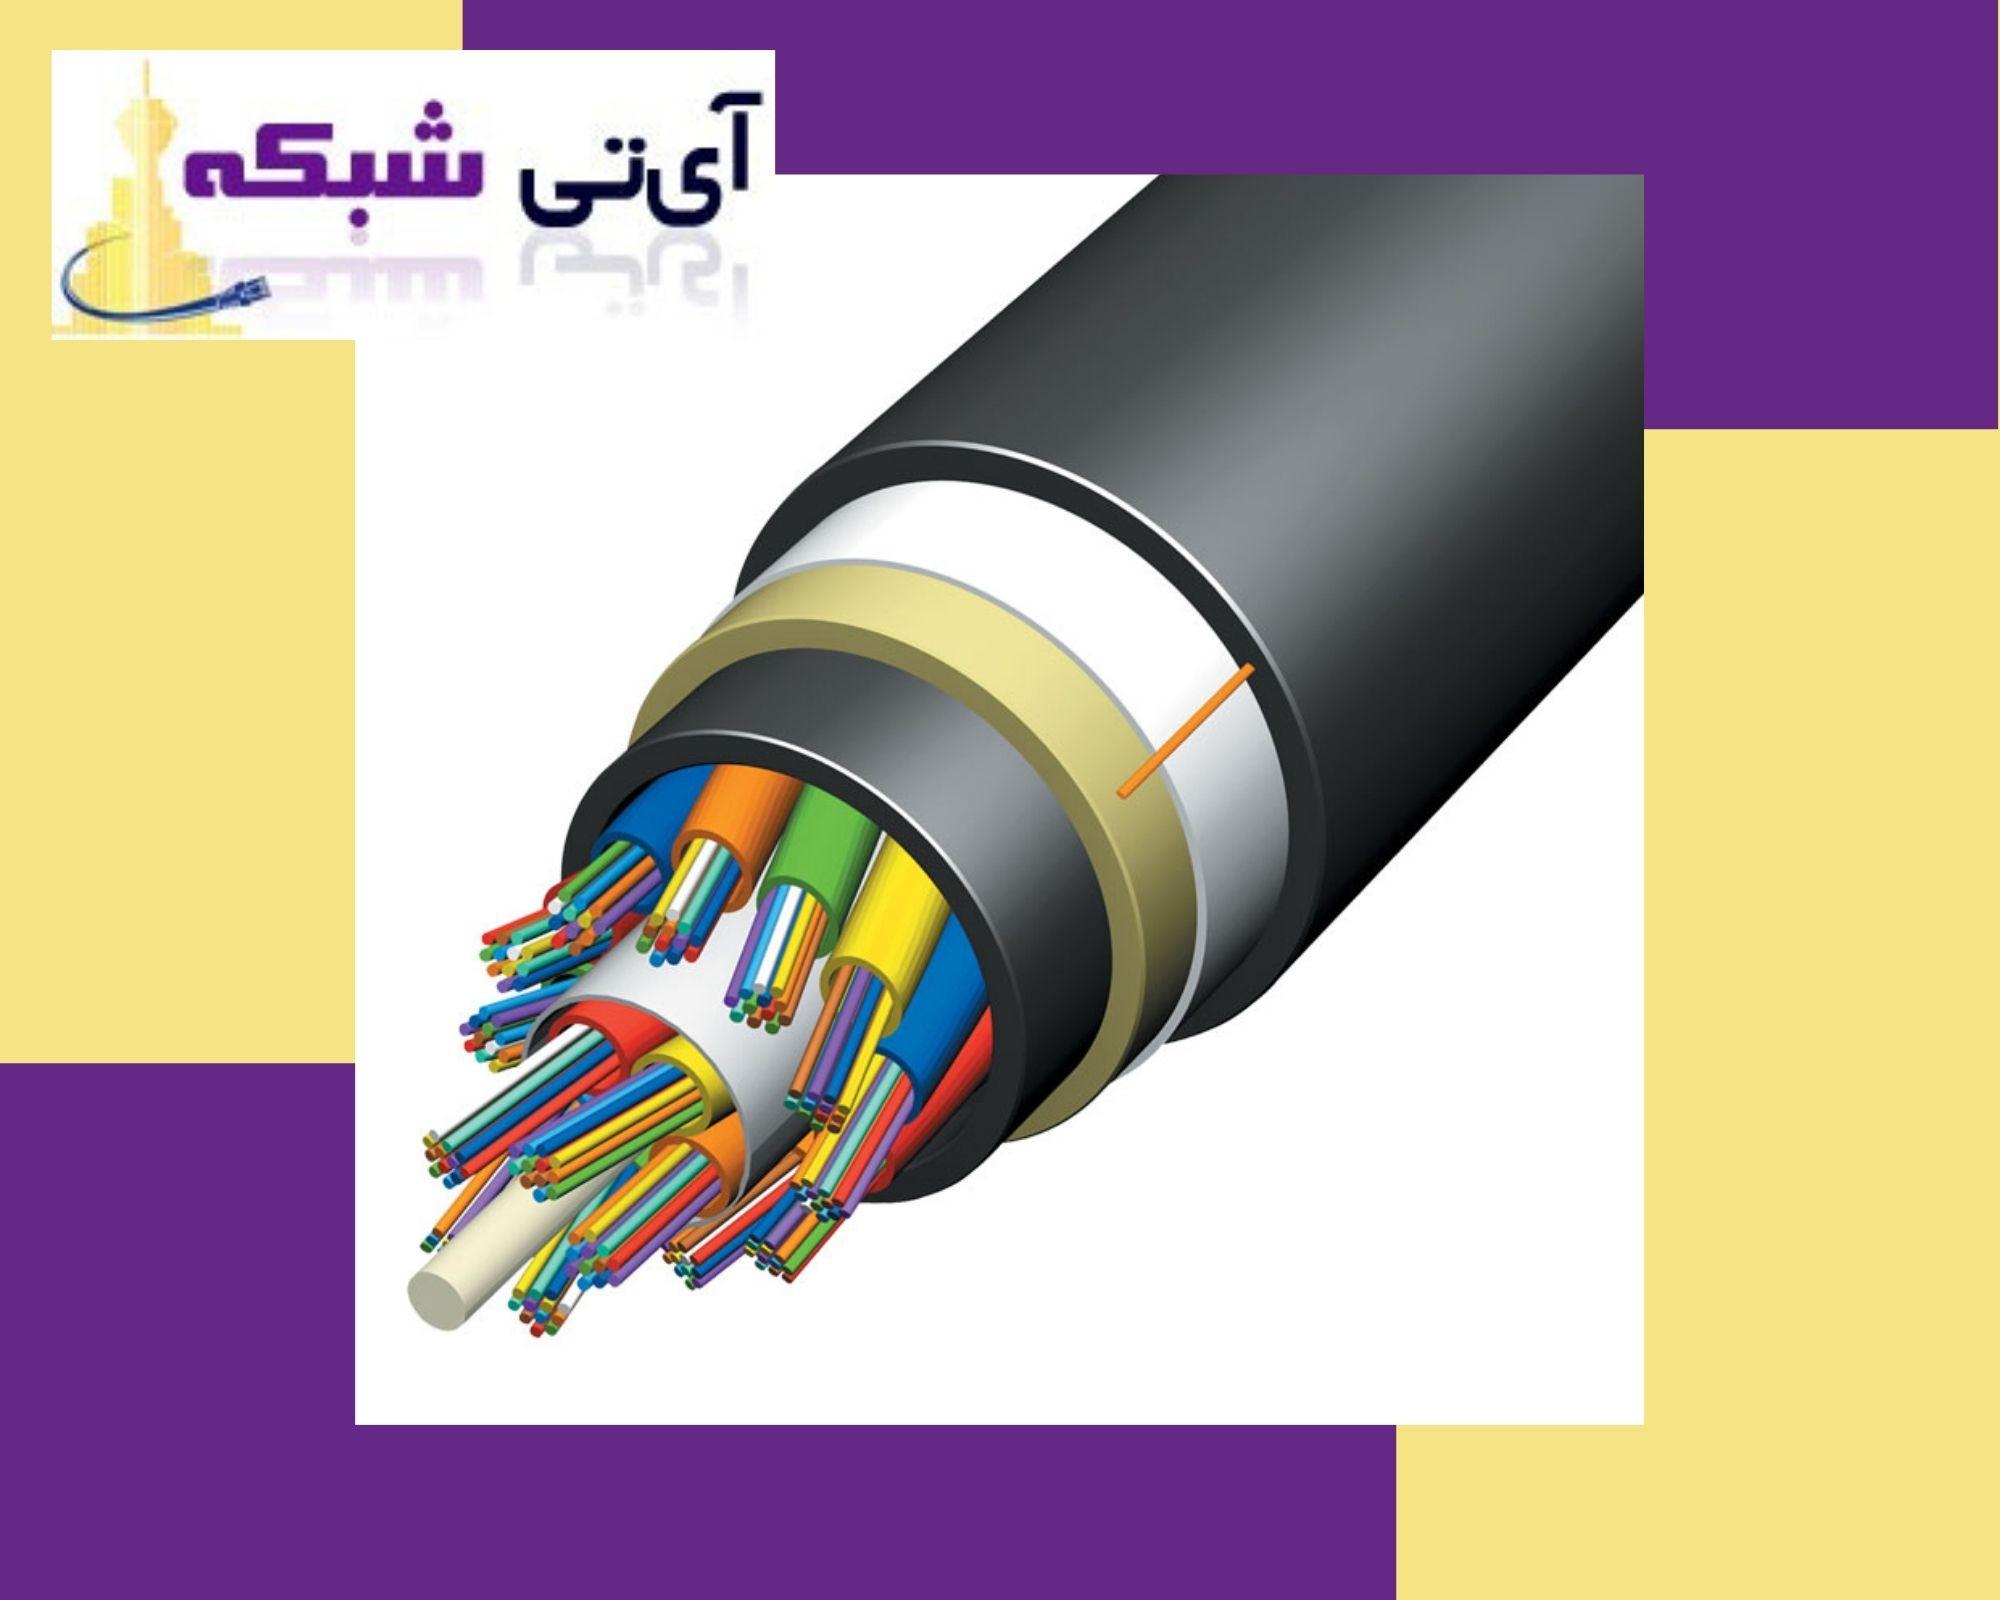 خرید - کابل - فیبر - نوری - ای تی - شبکه